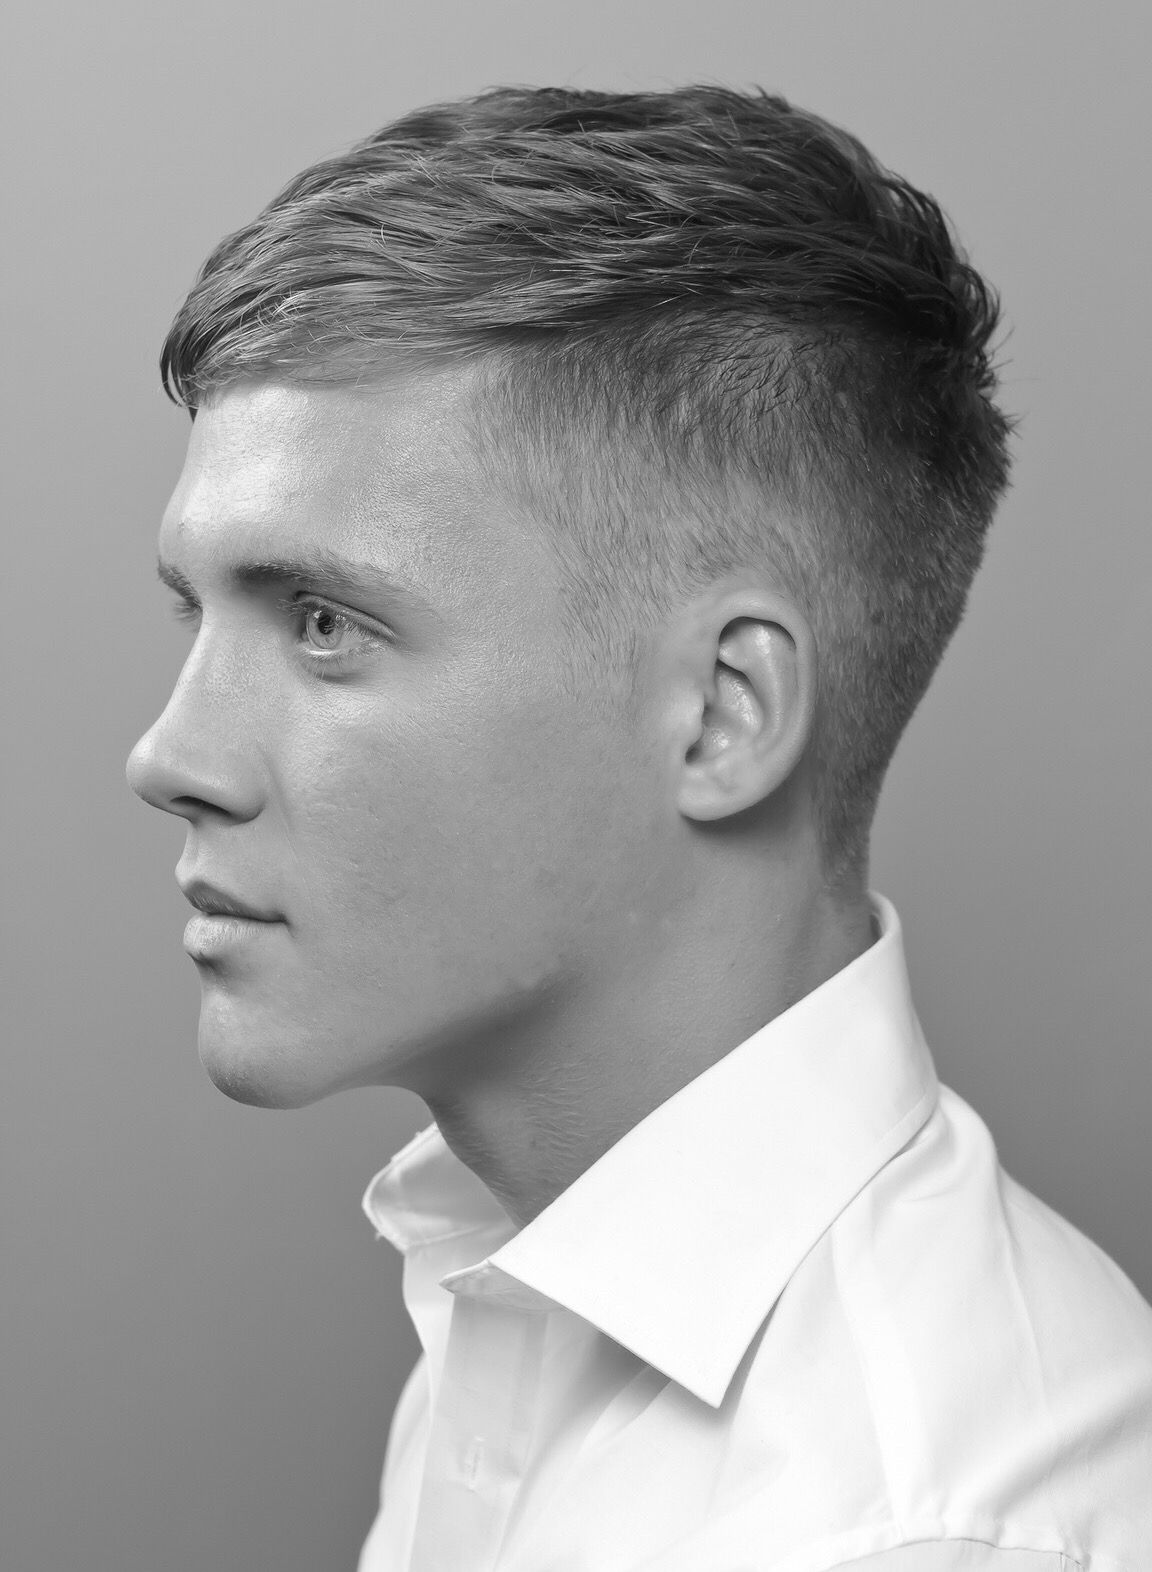 Men S Black White Look Mens Haircuts Fade Boys Haircuts Tapered Haircut